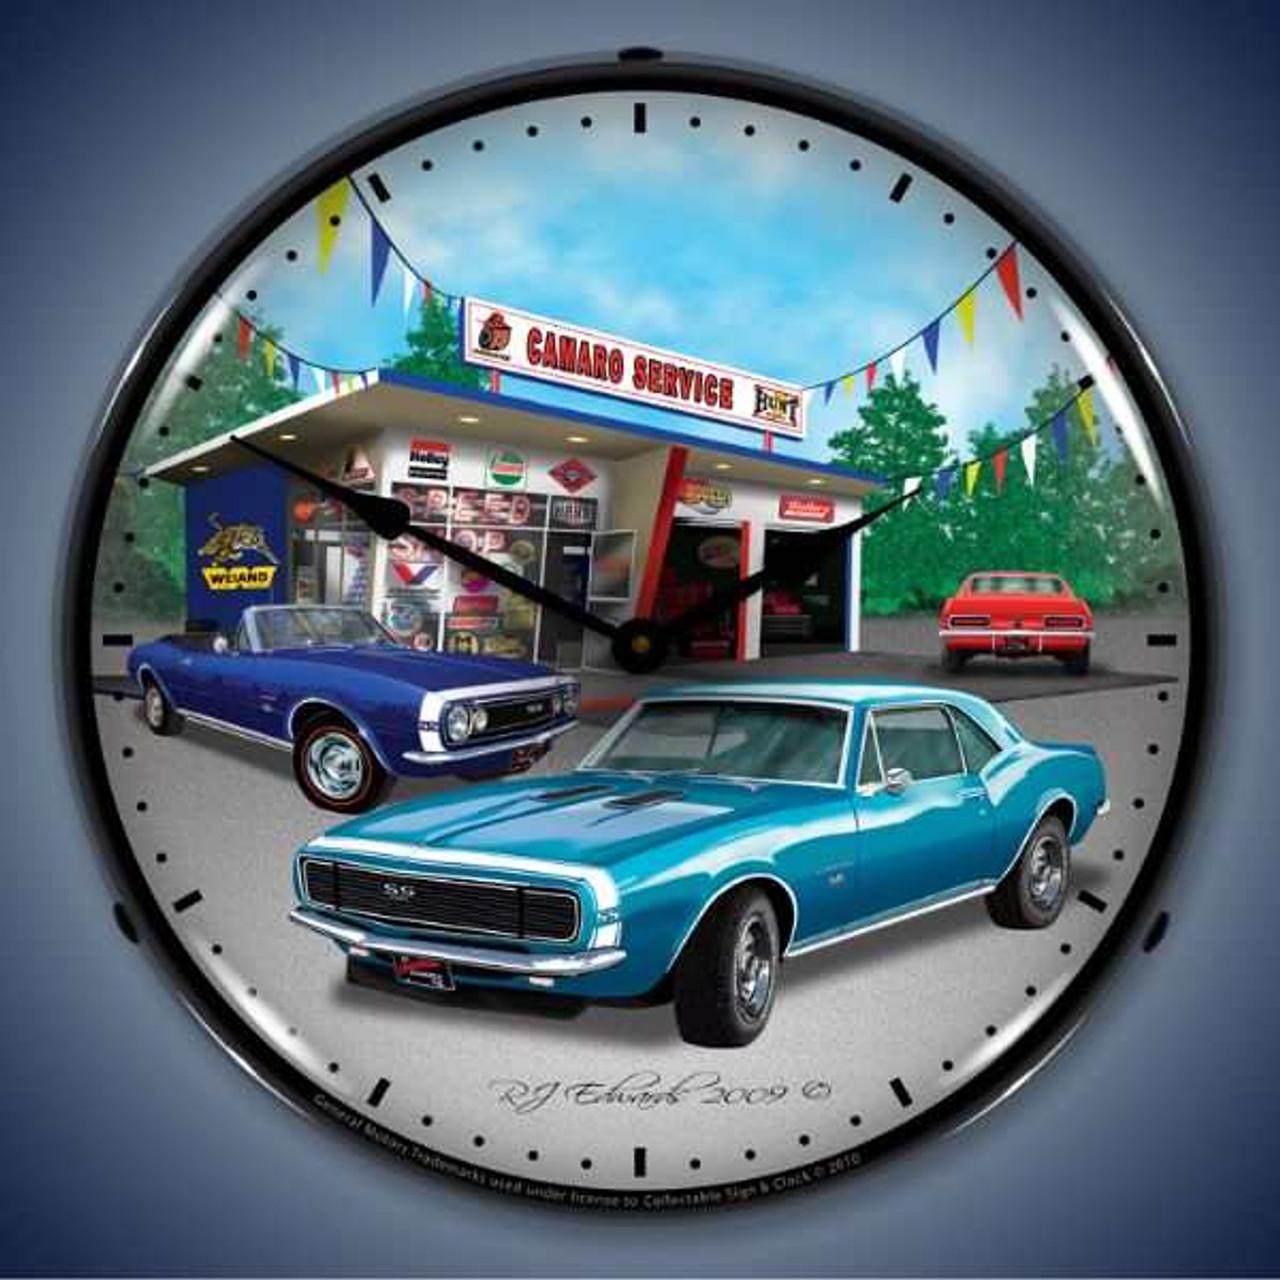 Retro  1967 Camaro Lighted Wall Clock 14 x 14 Inches